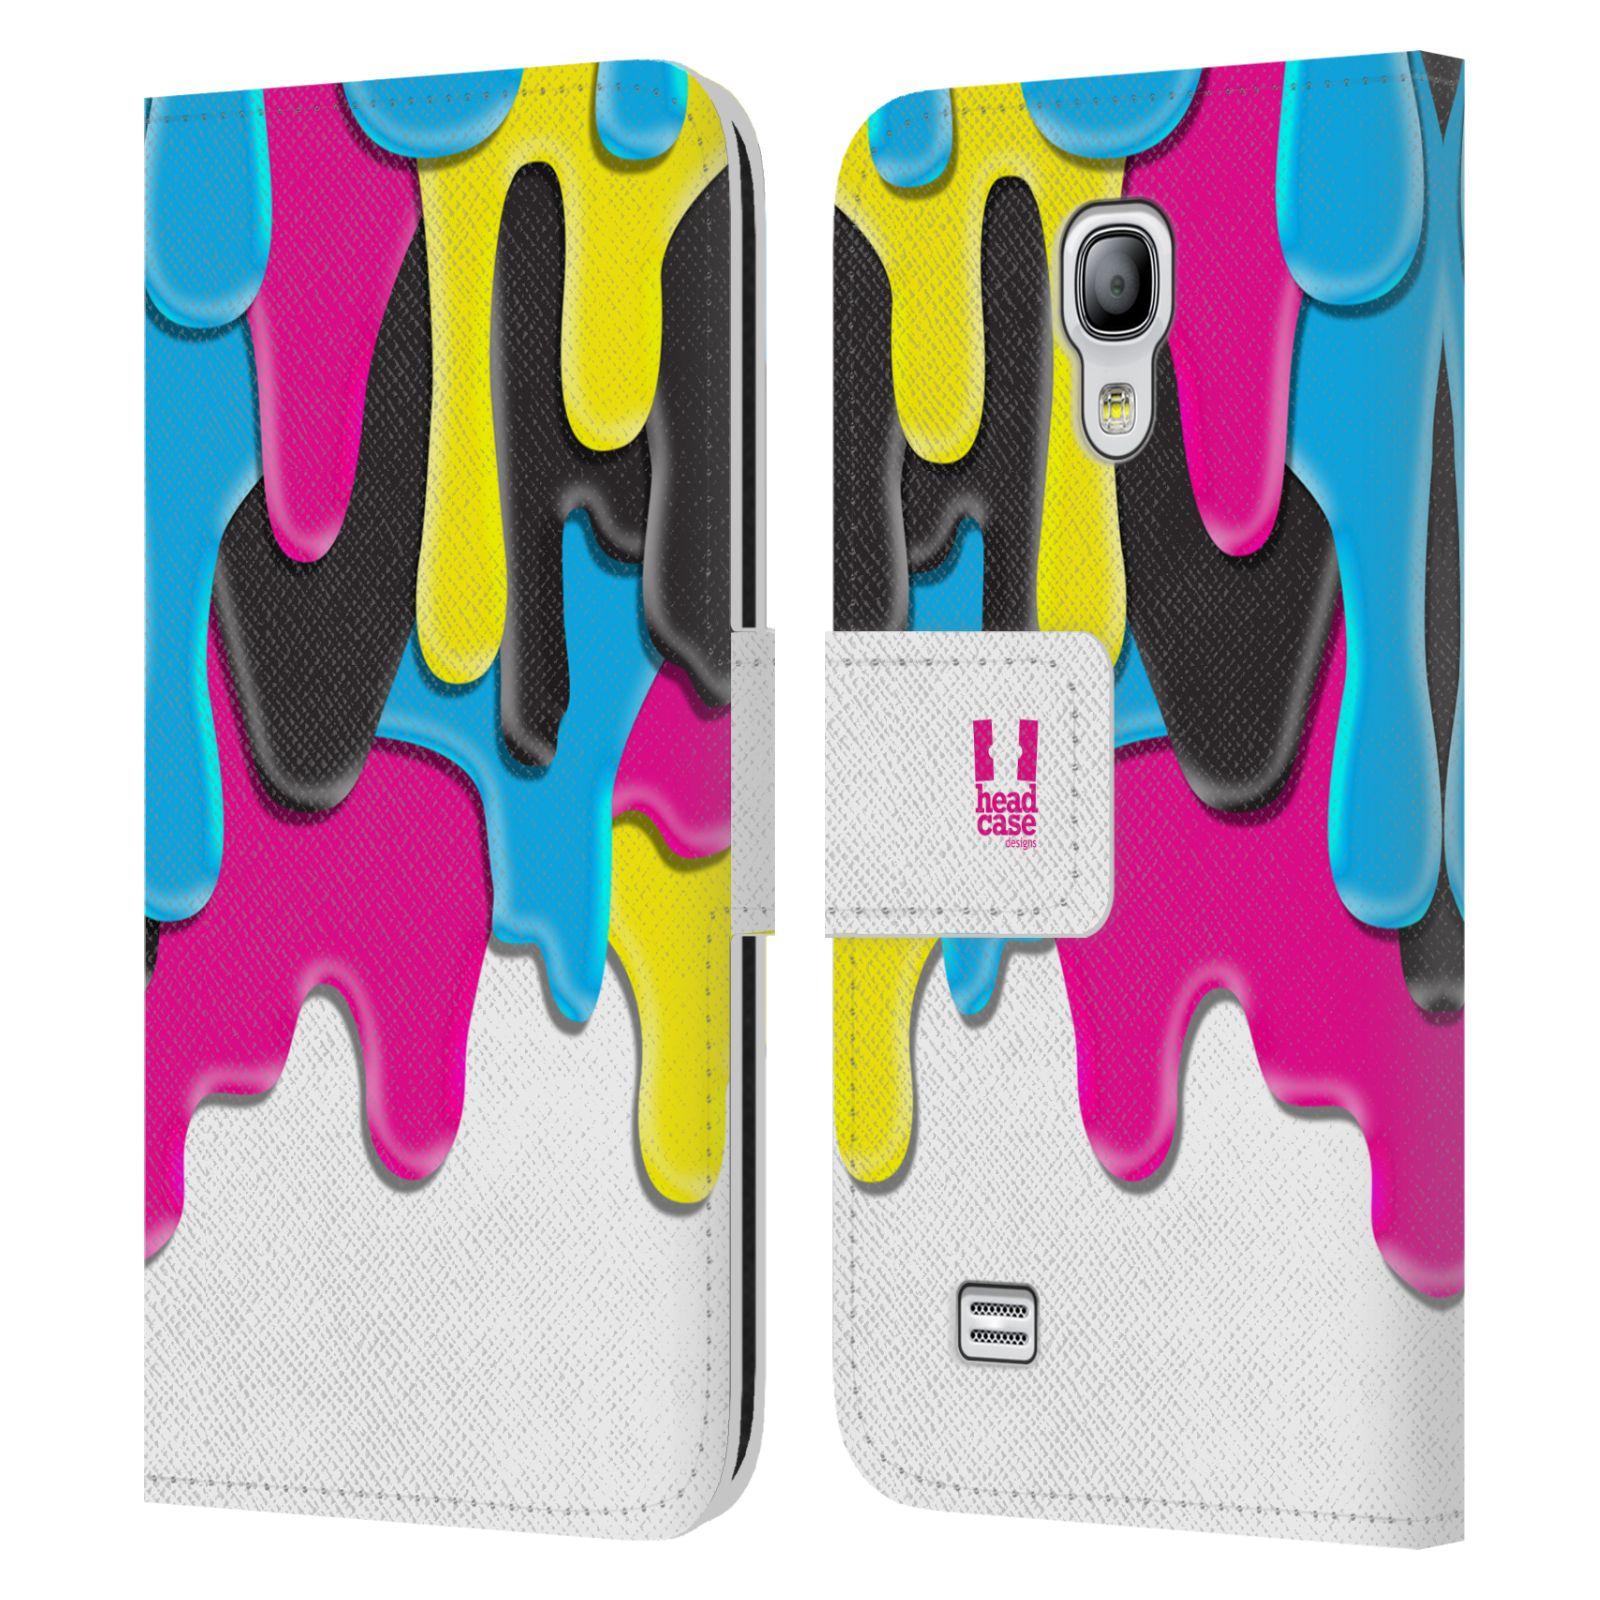 HEAD CASE Flipové pouzdro pro mobil Samsung Galaxy S4 MINI / S4 MINI DUOS ZÁPLAVA BARVA MIX barev